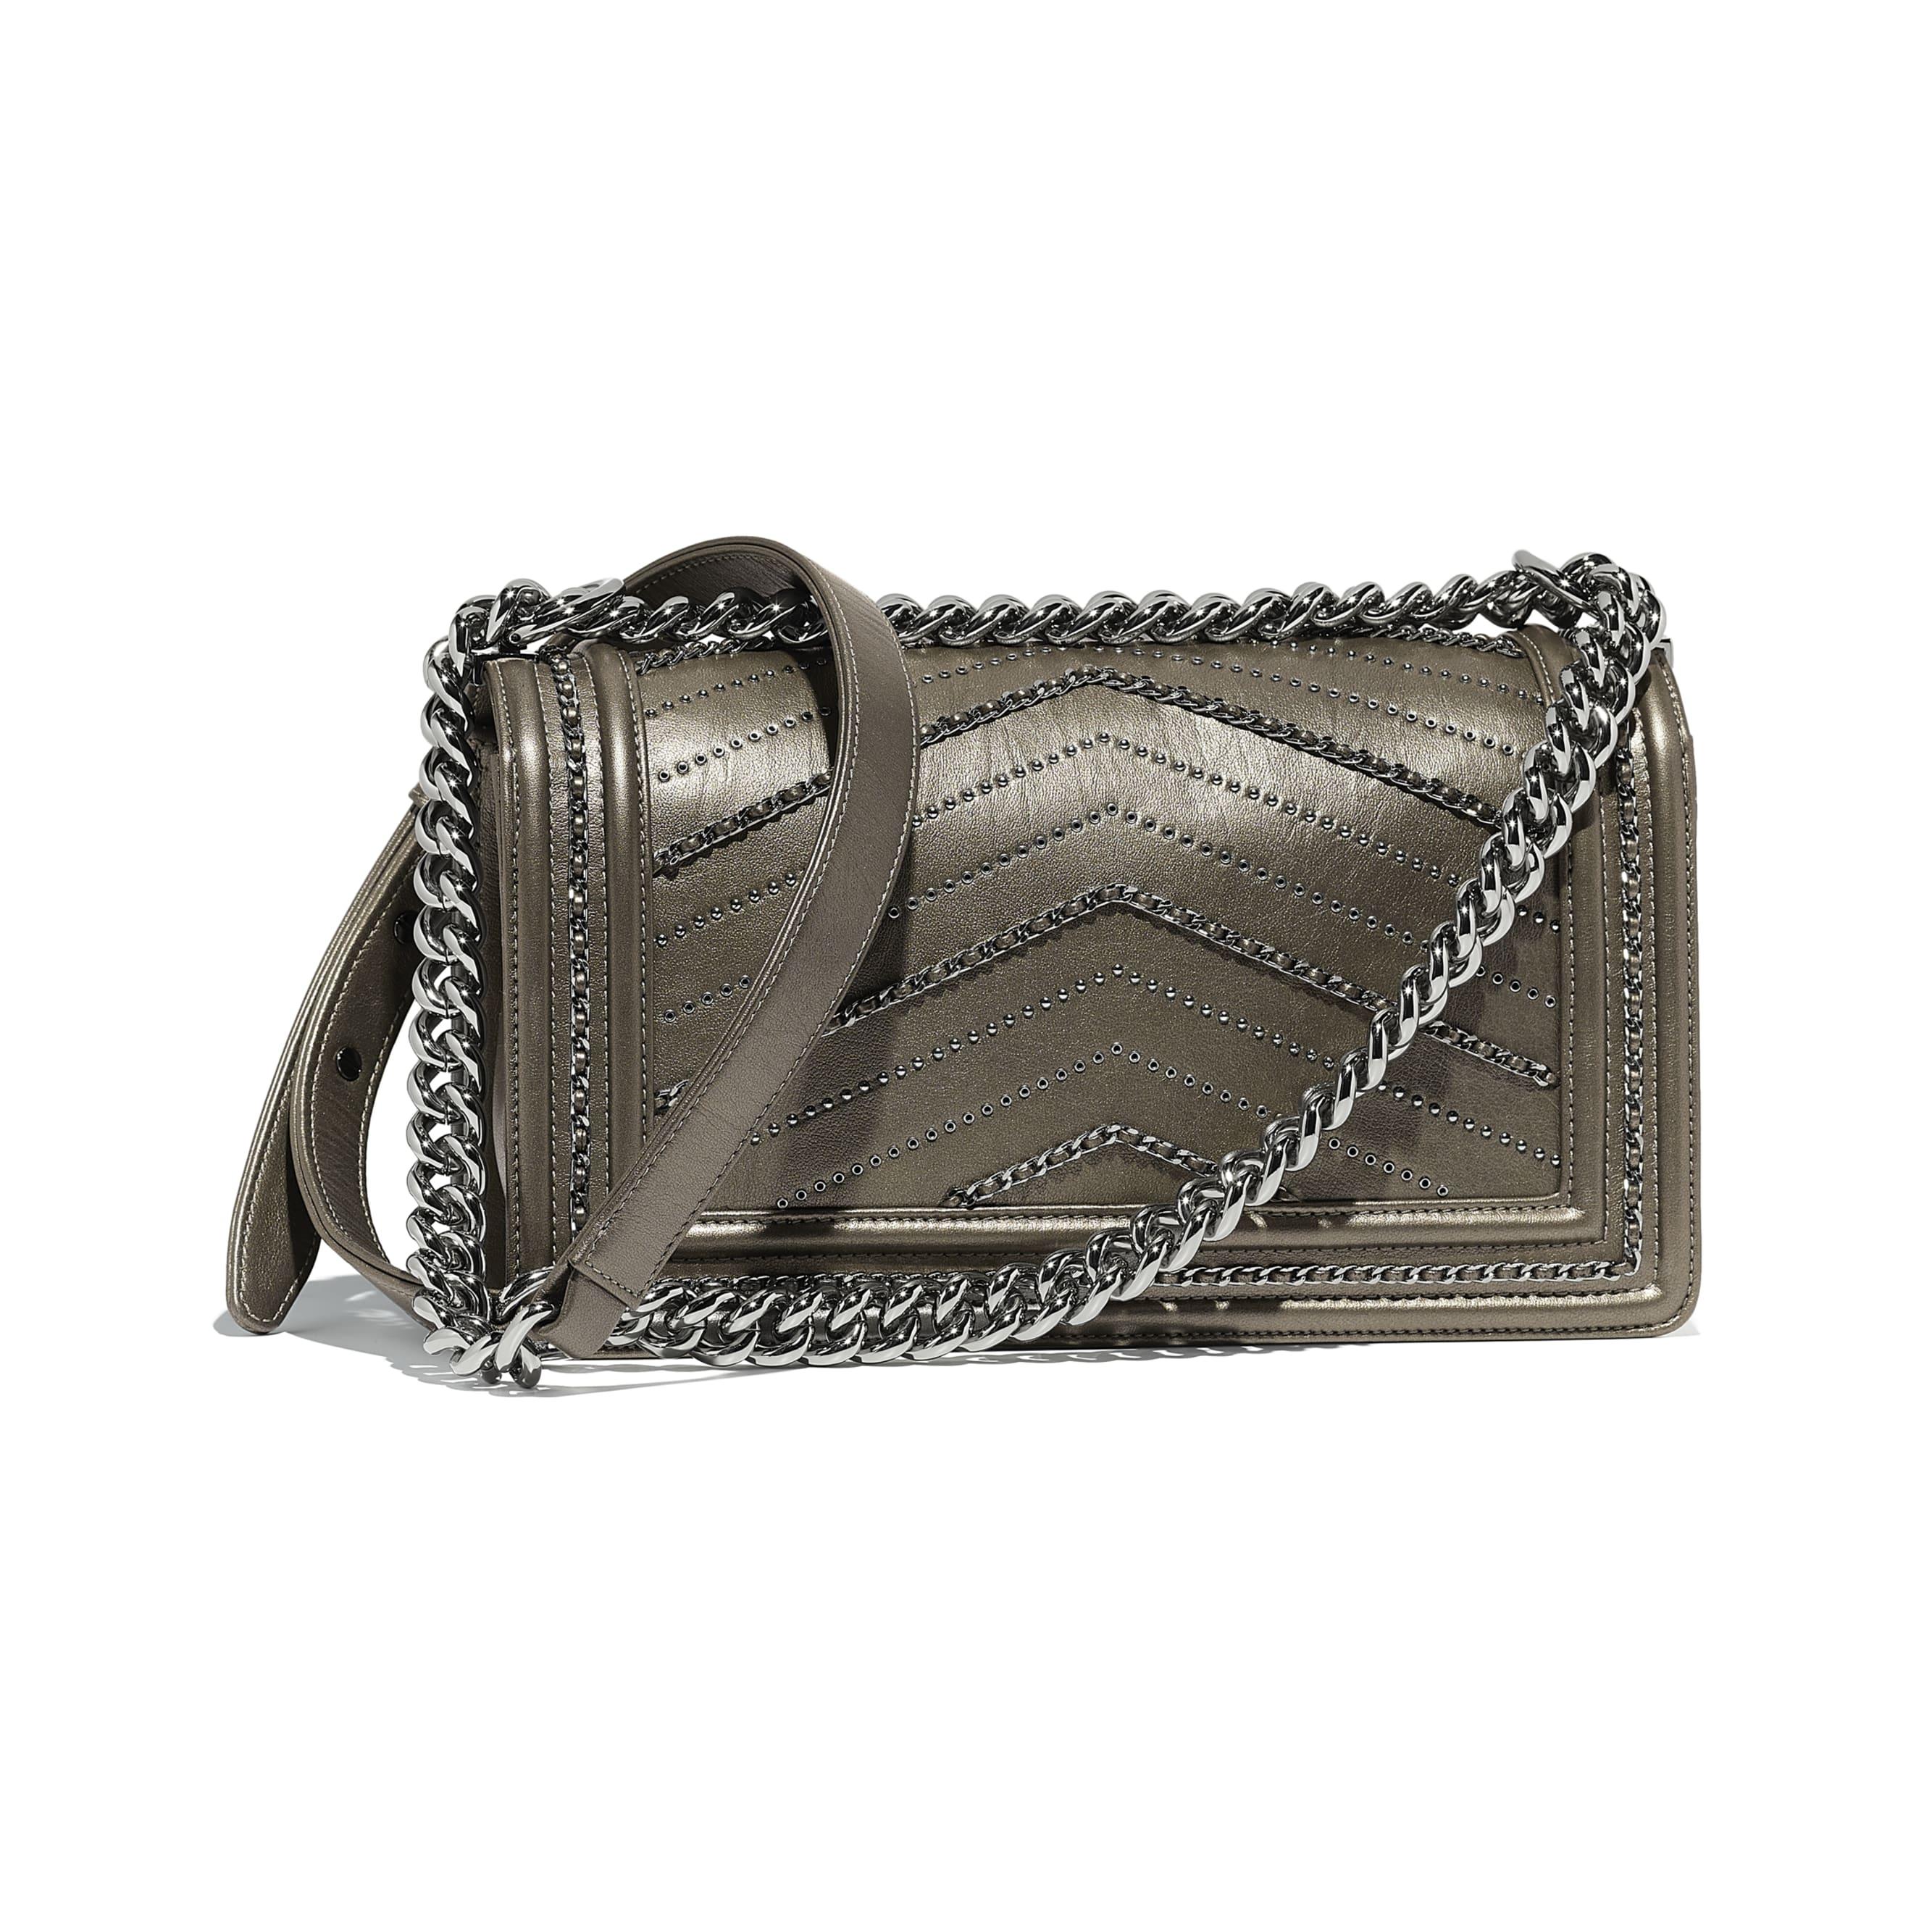 BOY CHANEL Handbag - Silver - Metallic Crumpled Calfskin & Ruthenium-Finish Metal - Alternative view - see standard sized version